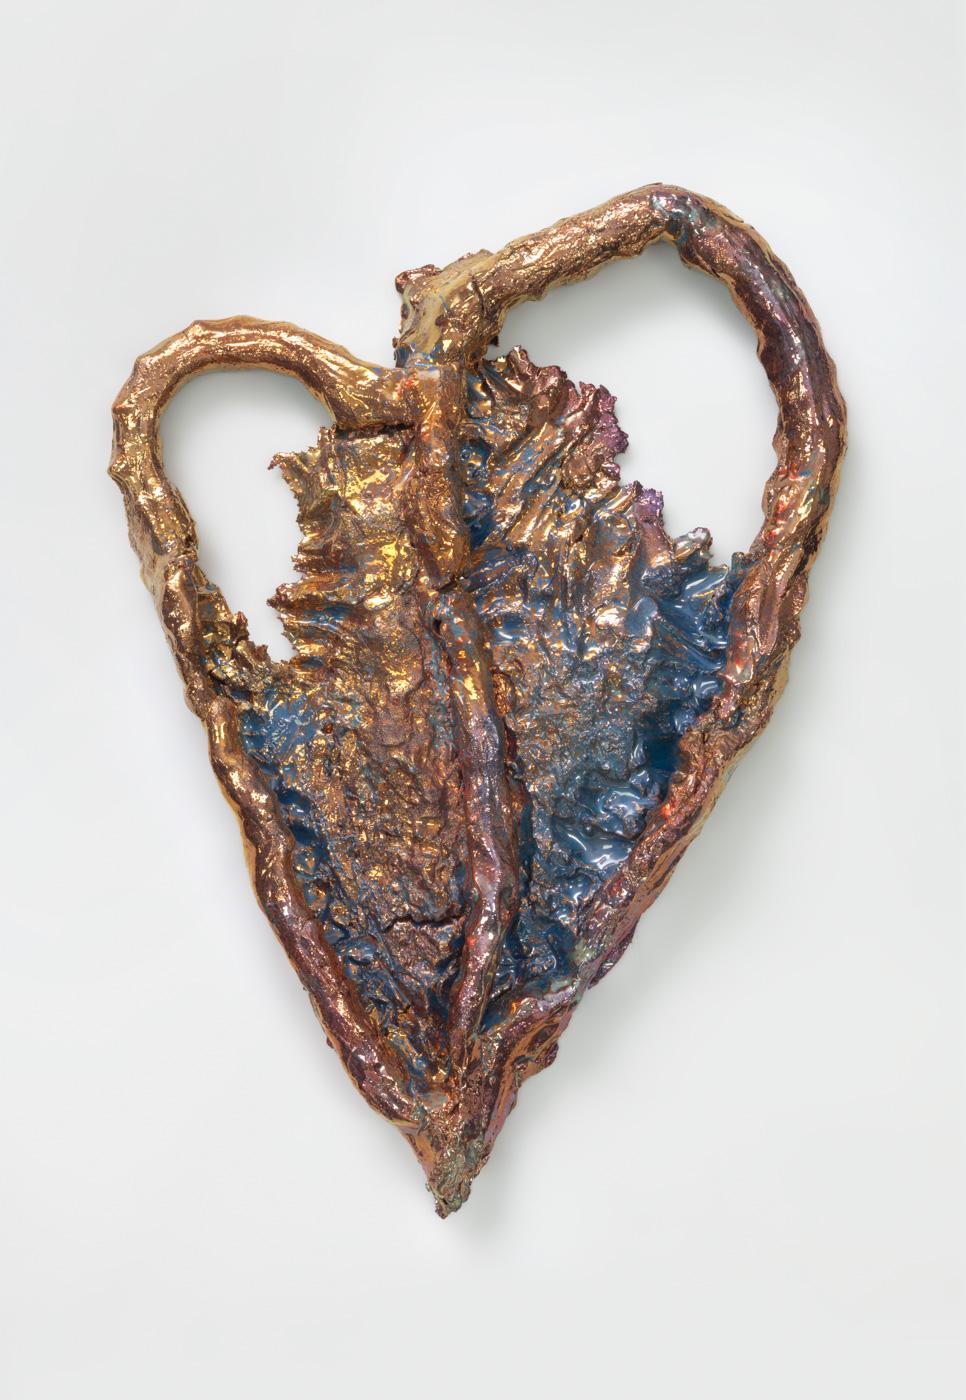 HEART (6833), 2018